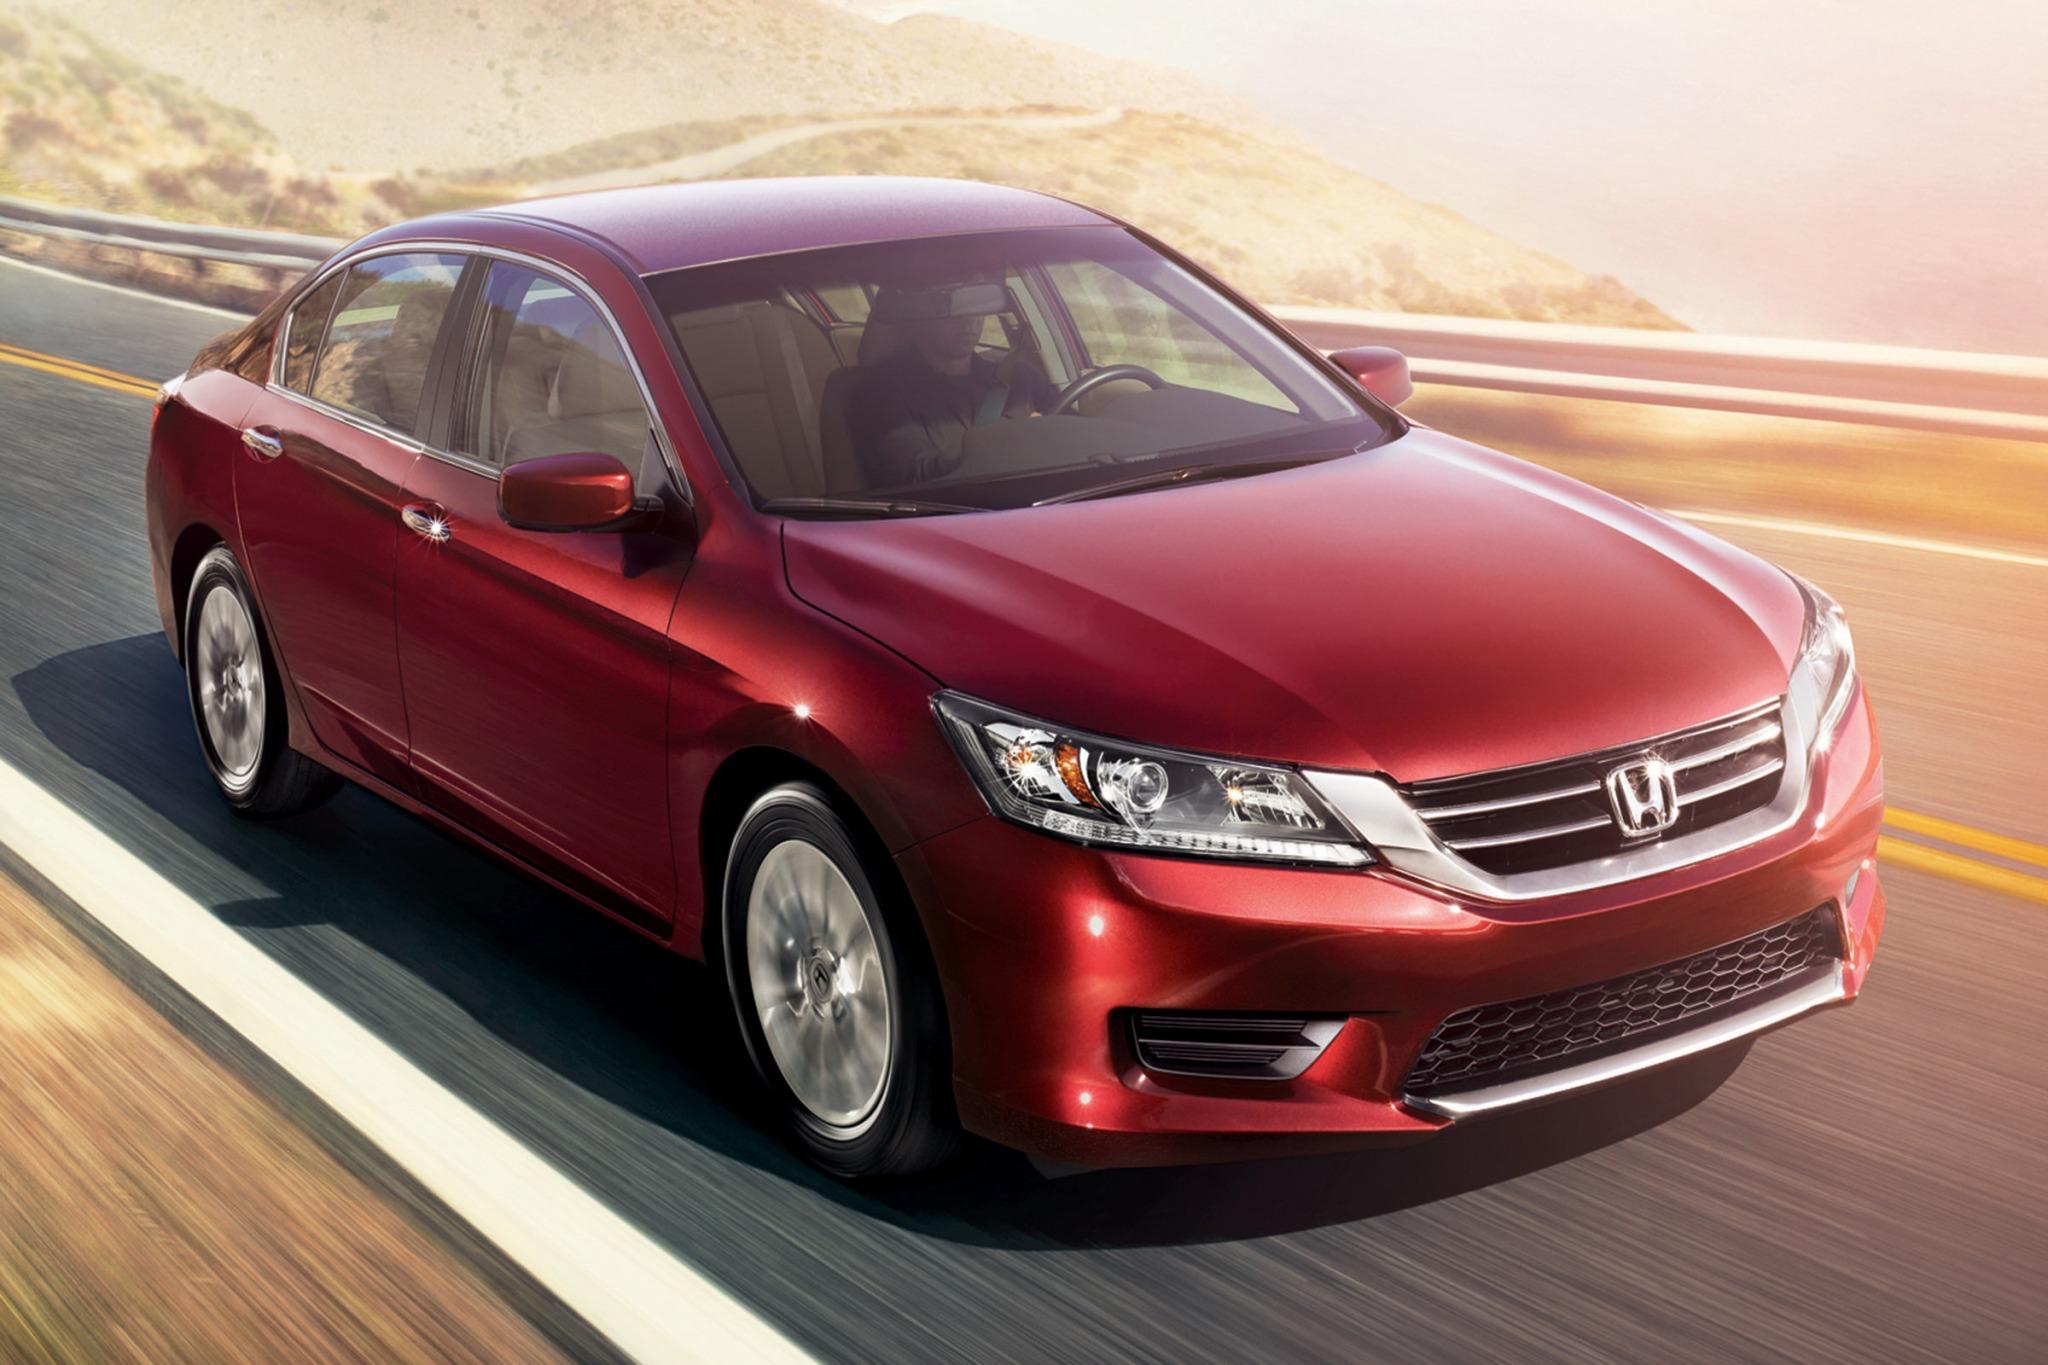 features lx photo price photos accord reviews sedan honda